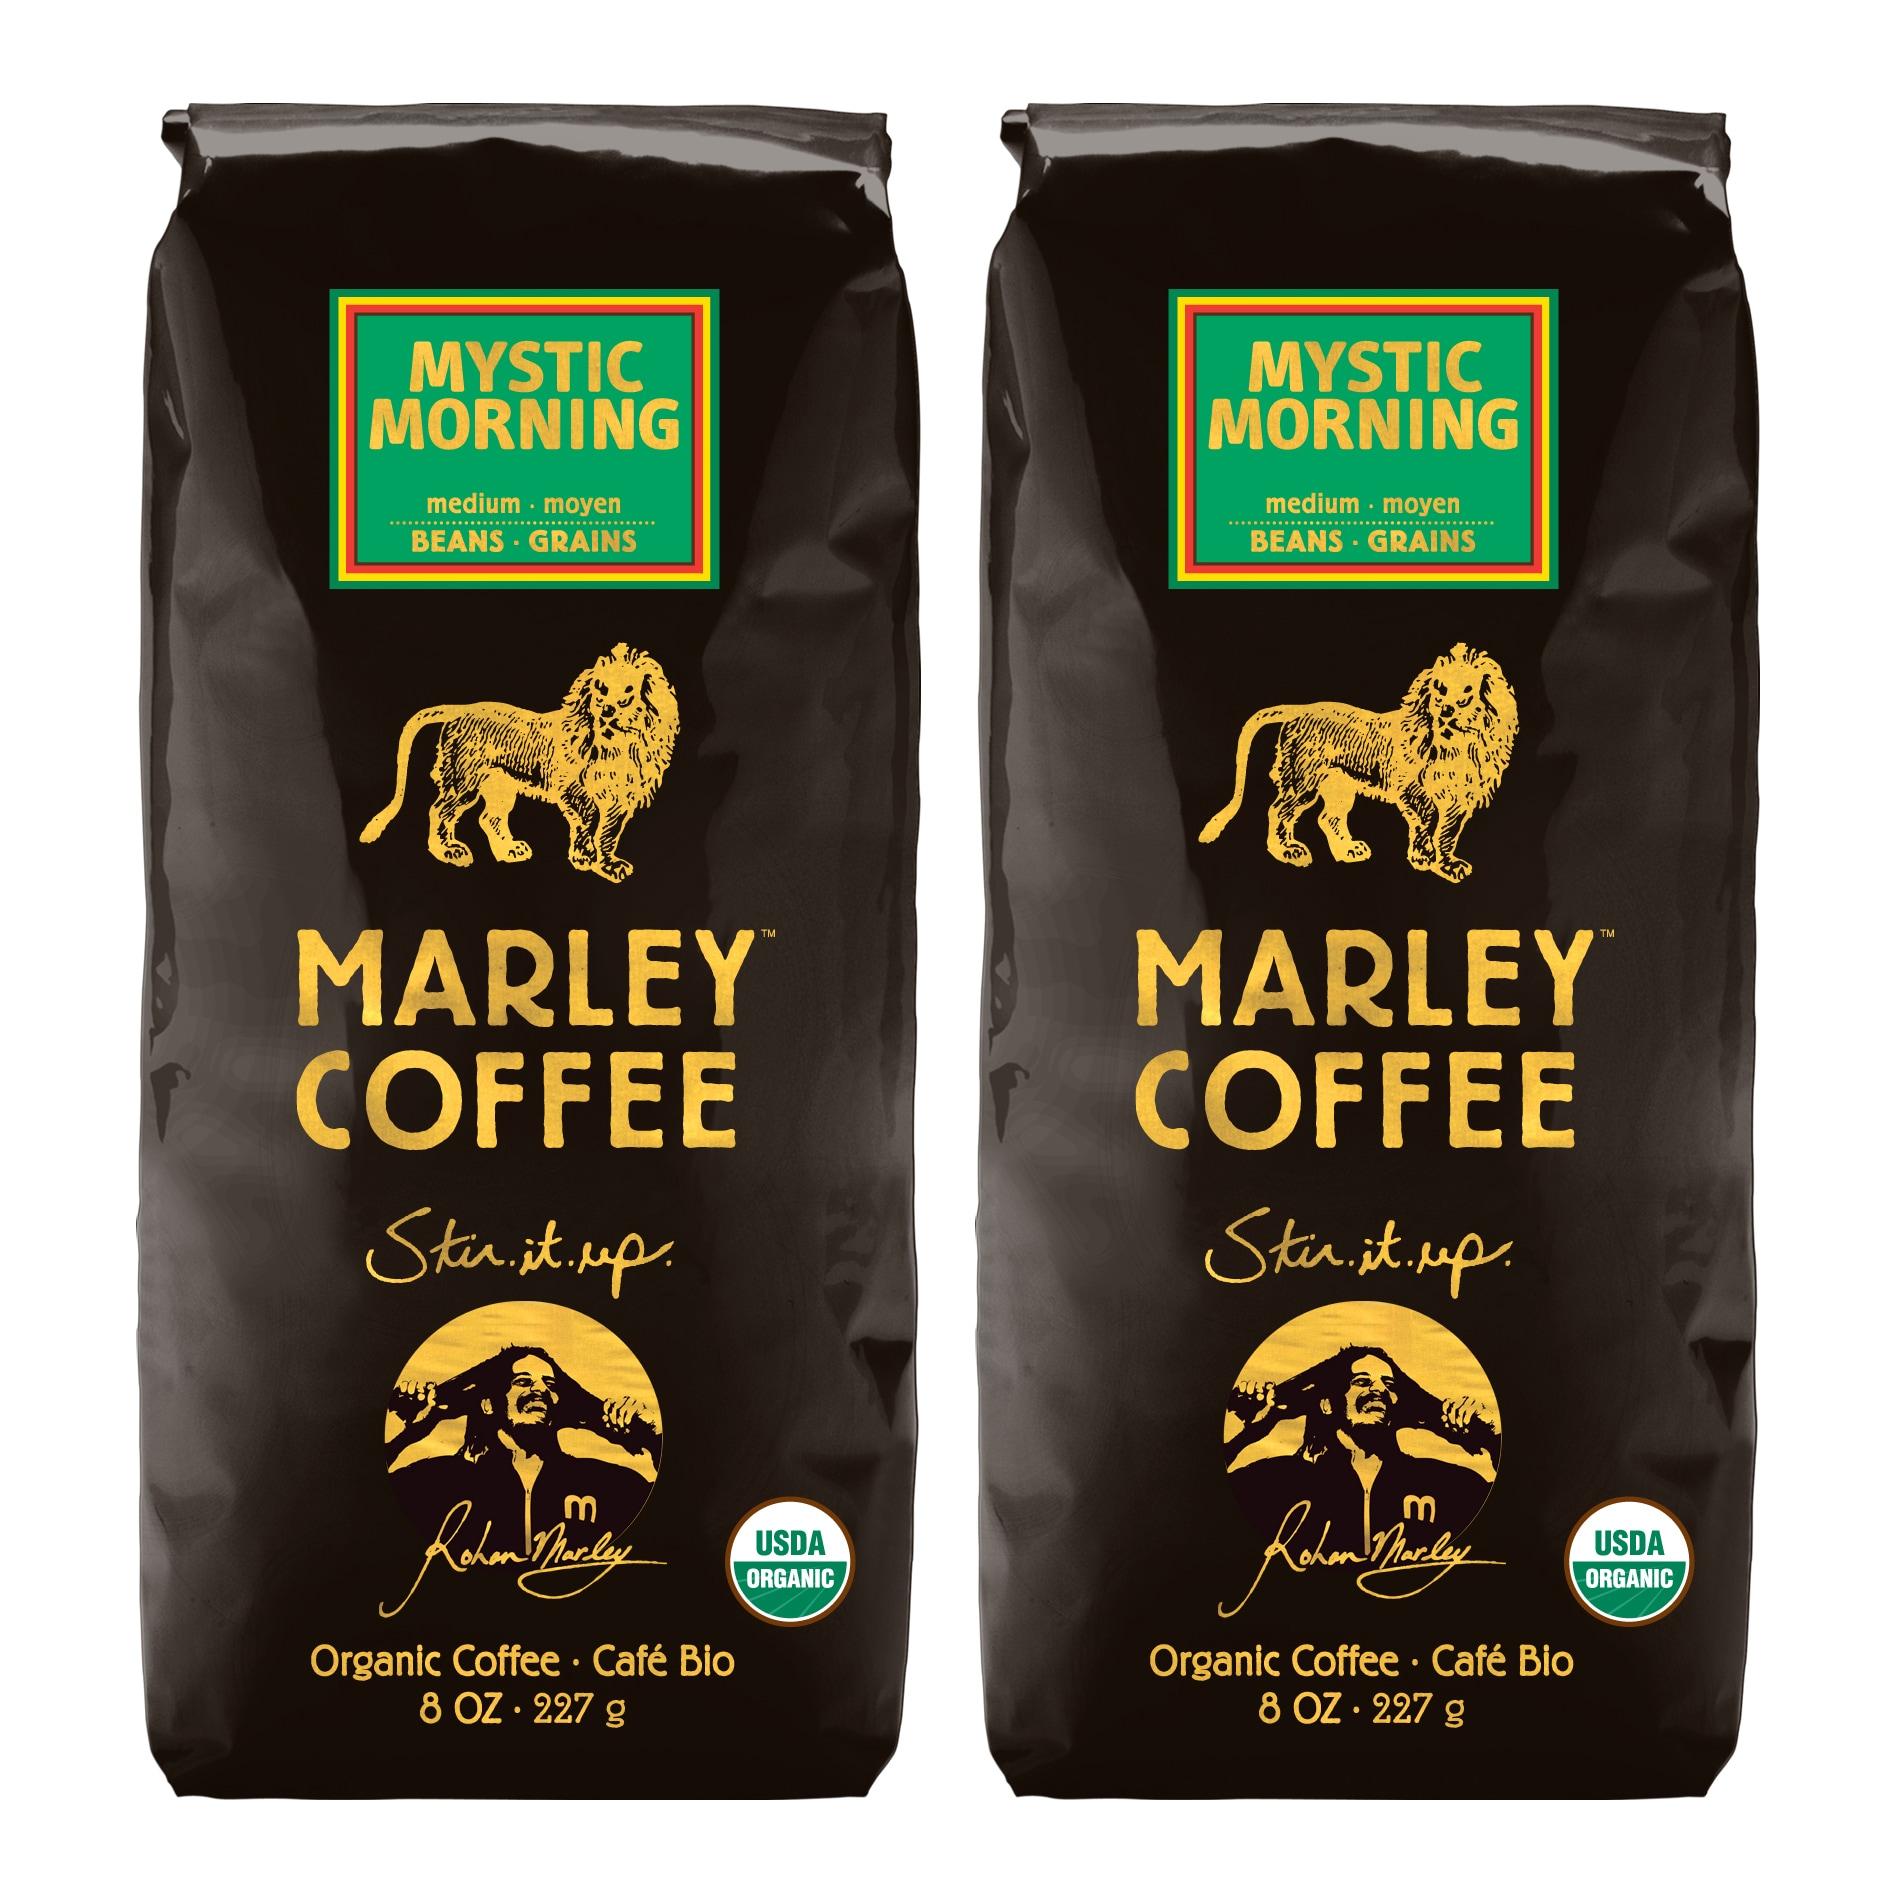 Marley Coffee Mystic Morning Whole Bean Coffee (1 Pound)